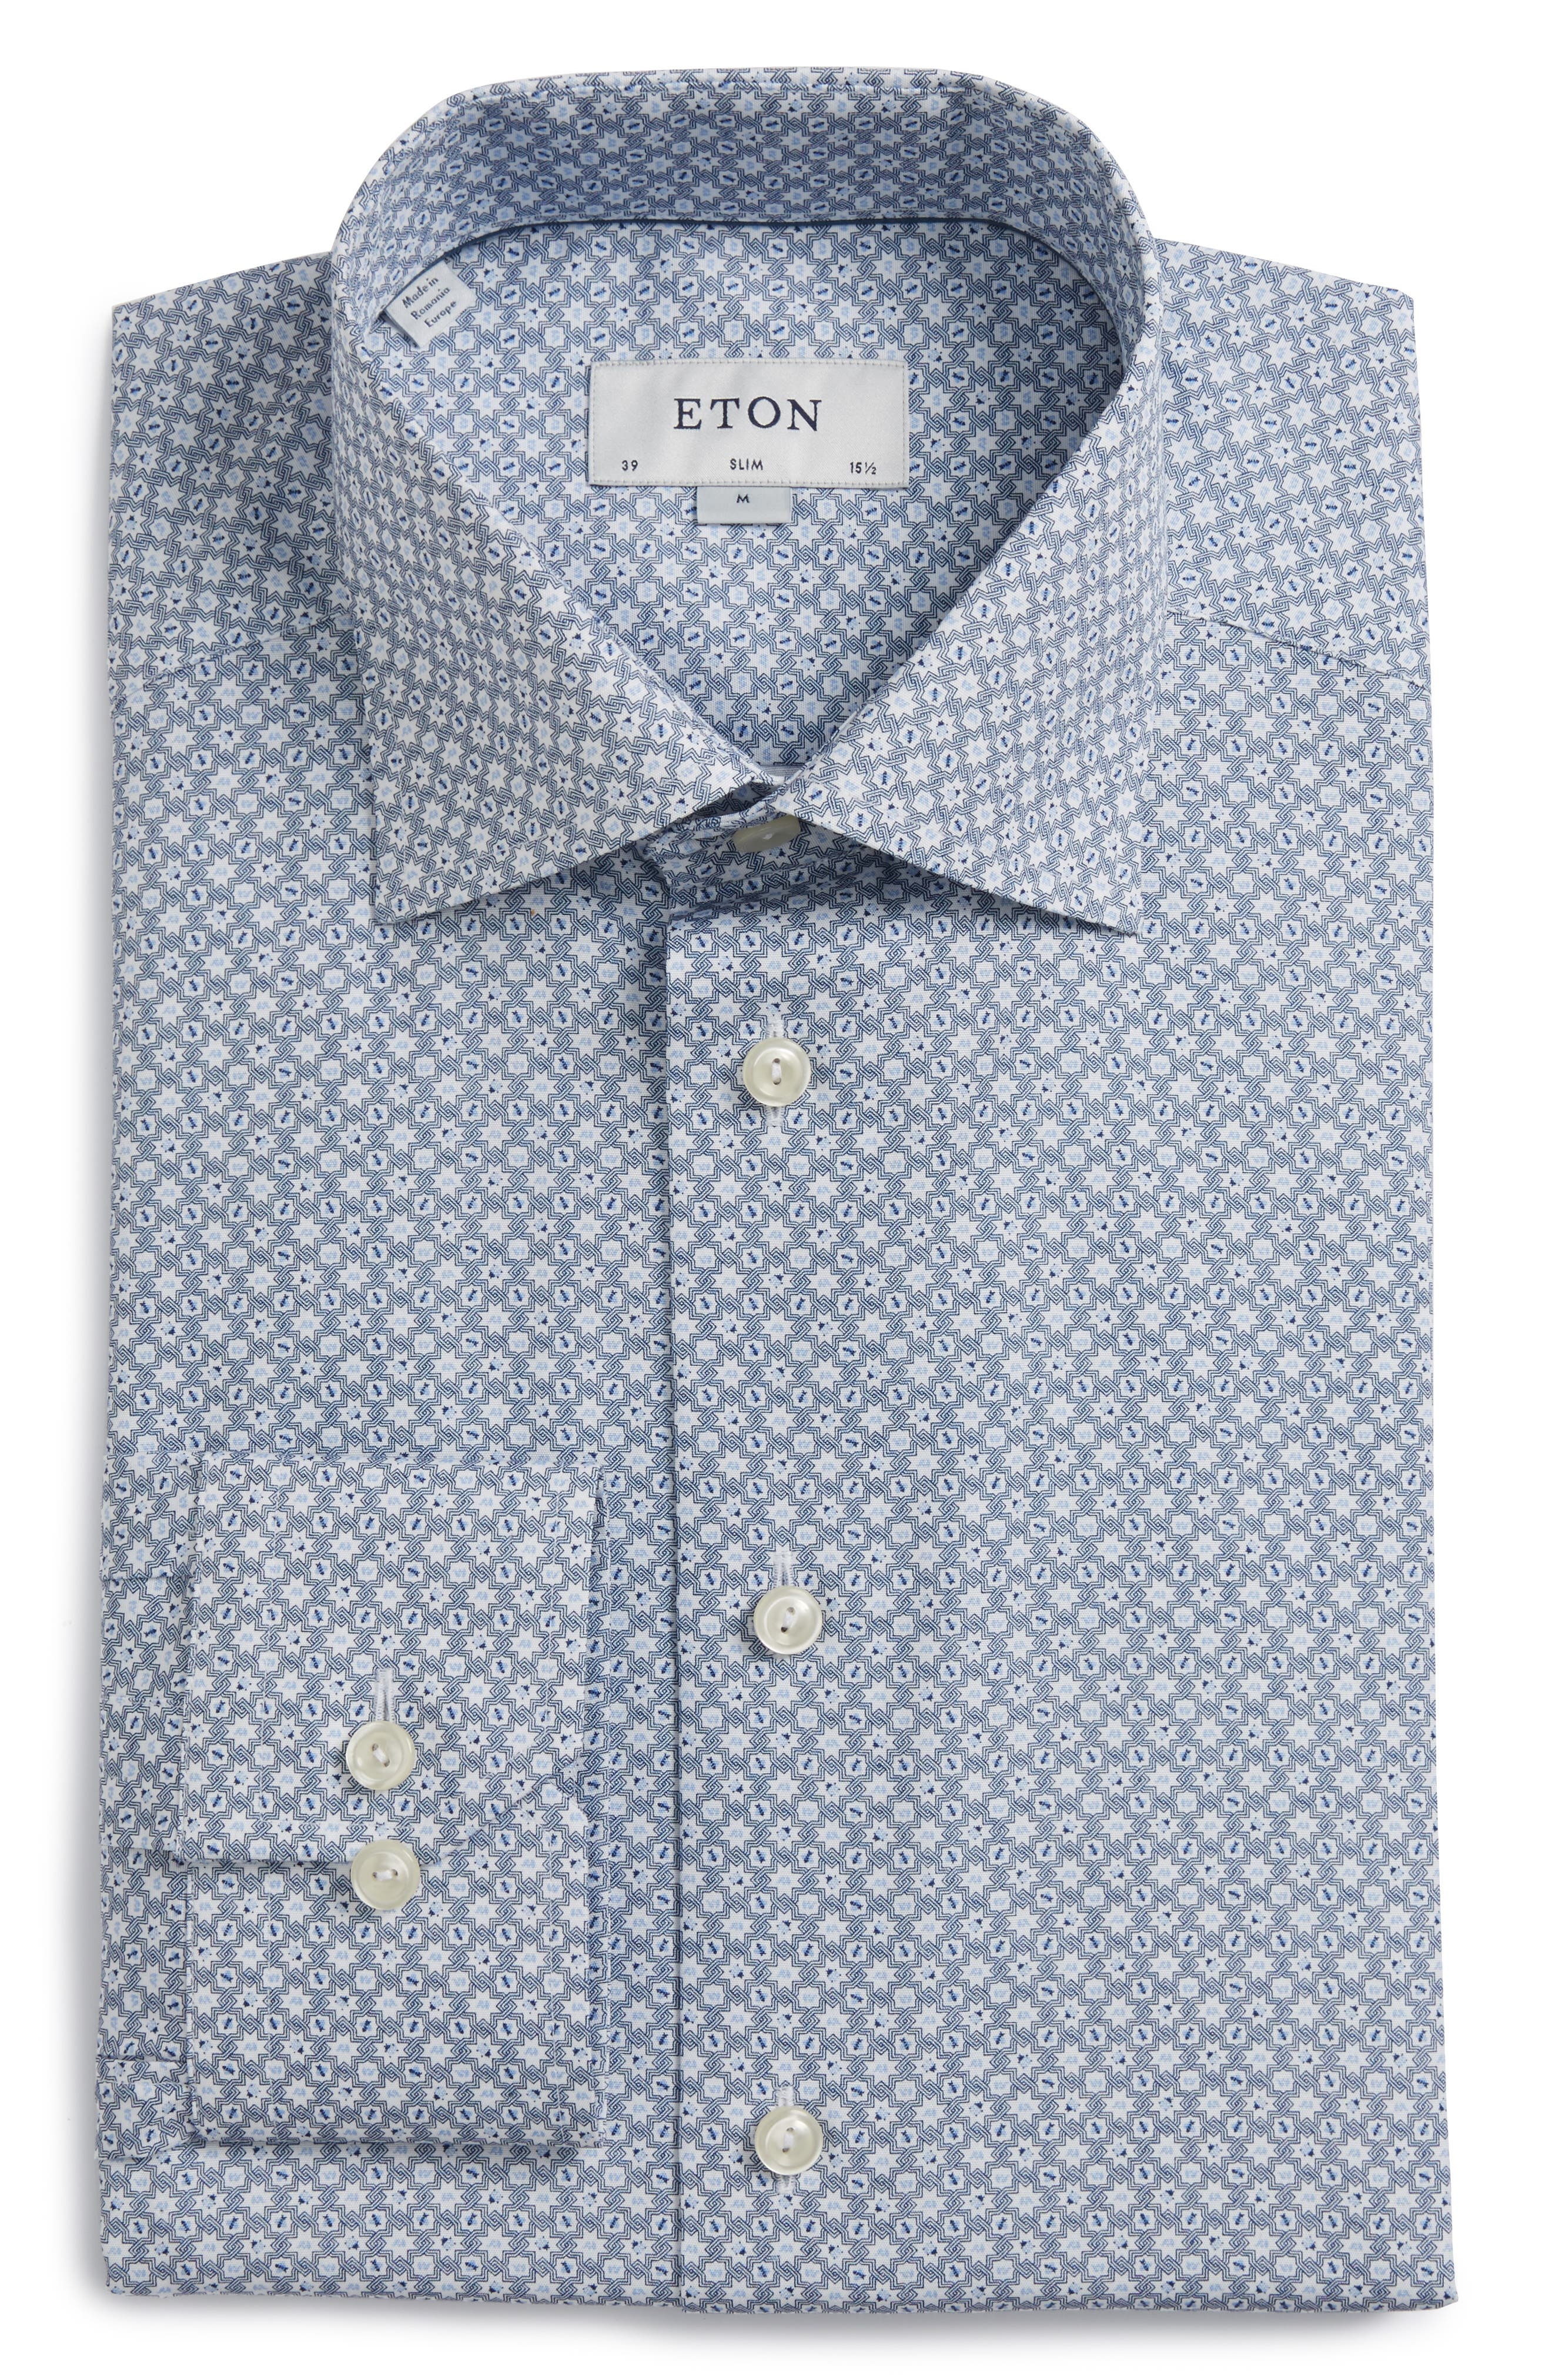 Alternate Image 1 Selected - Eton Slim Fit Print Dress Shirt